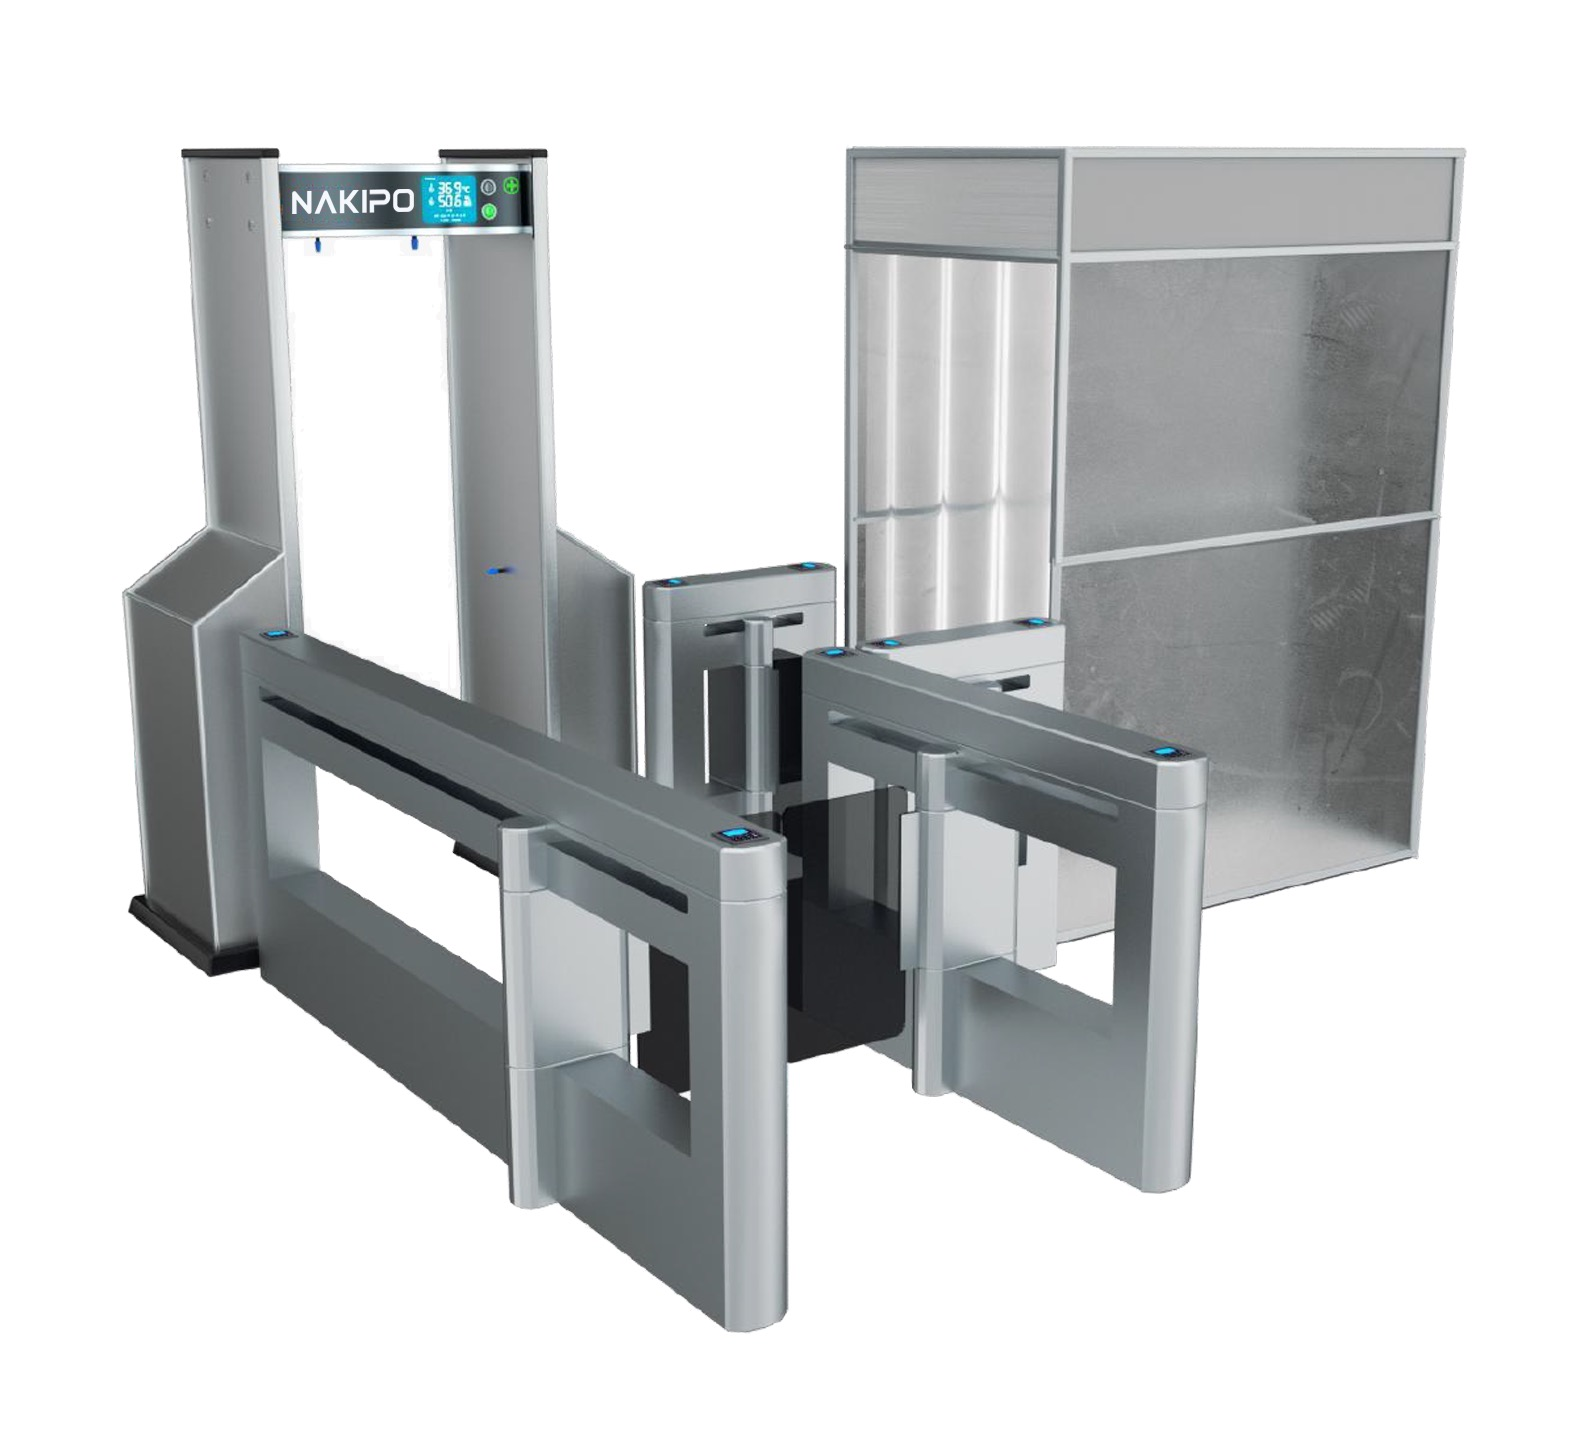 CONDOR | מערכת בקרה למדידת חום, חיטוי והכוונה